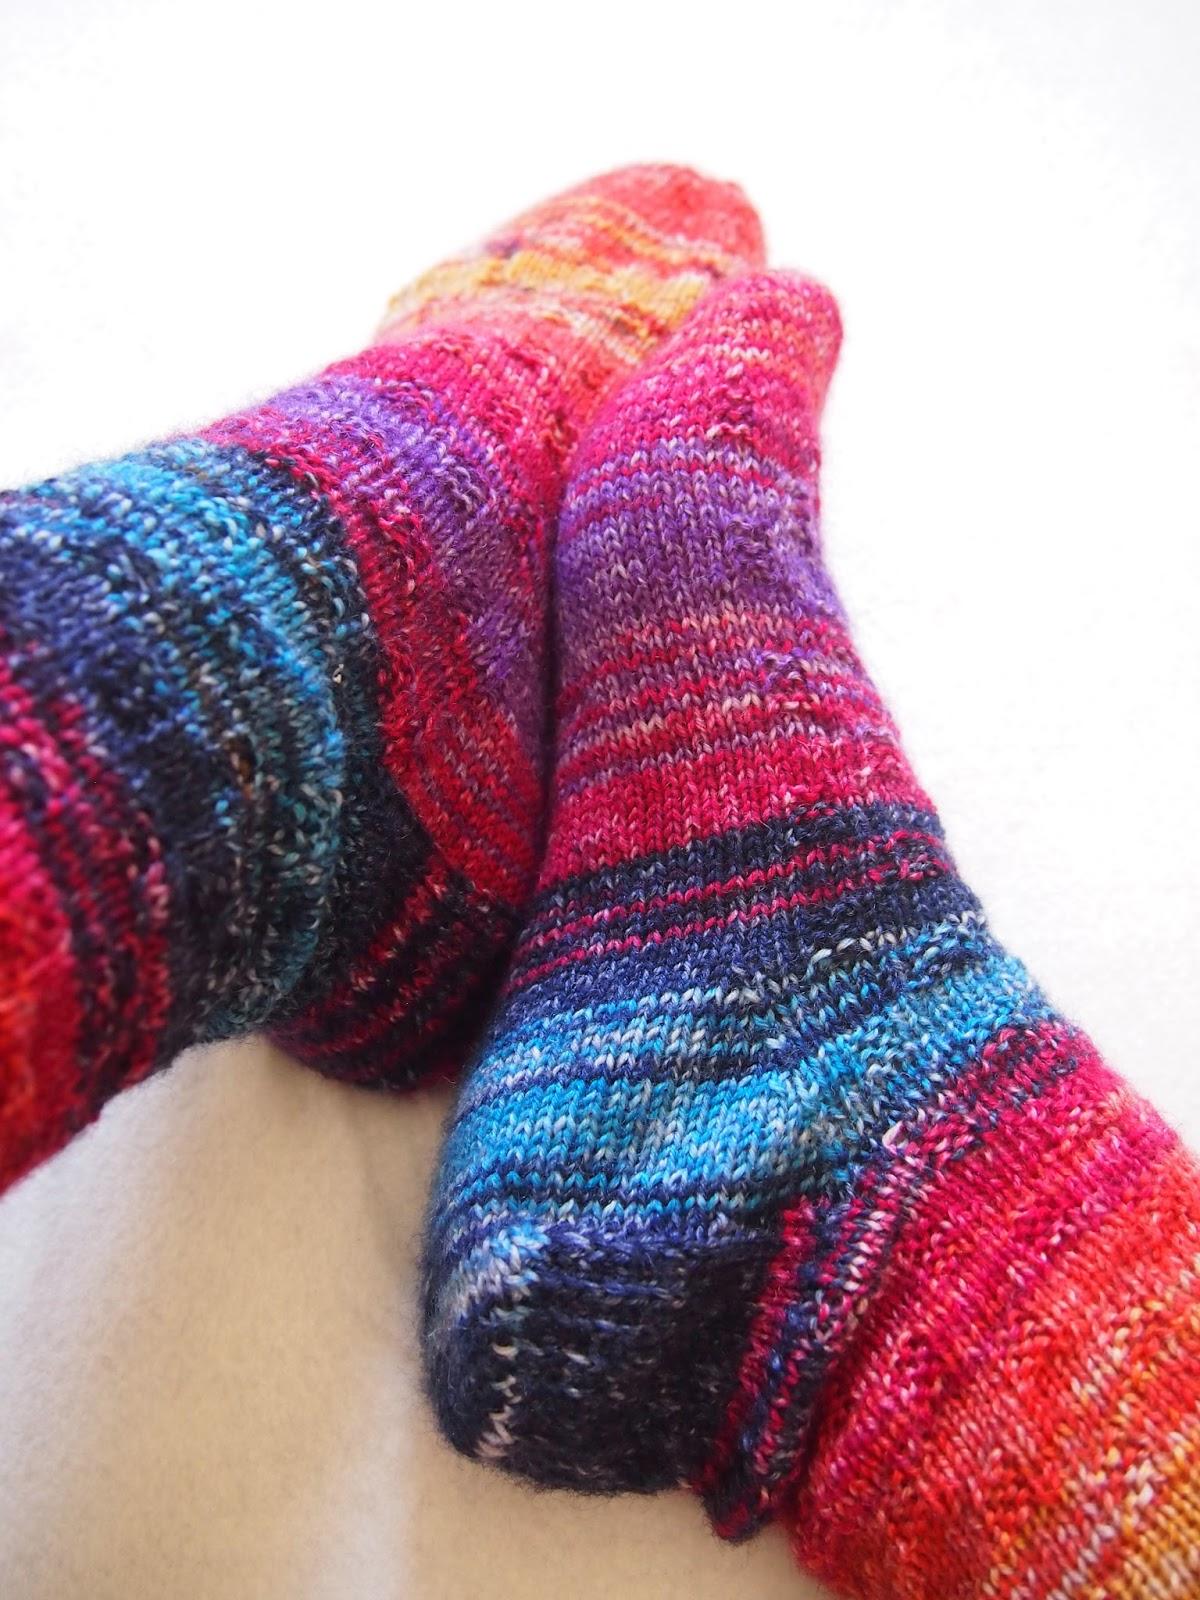 Nightingale & Dolittle: Knitting: My first socks!